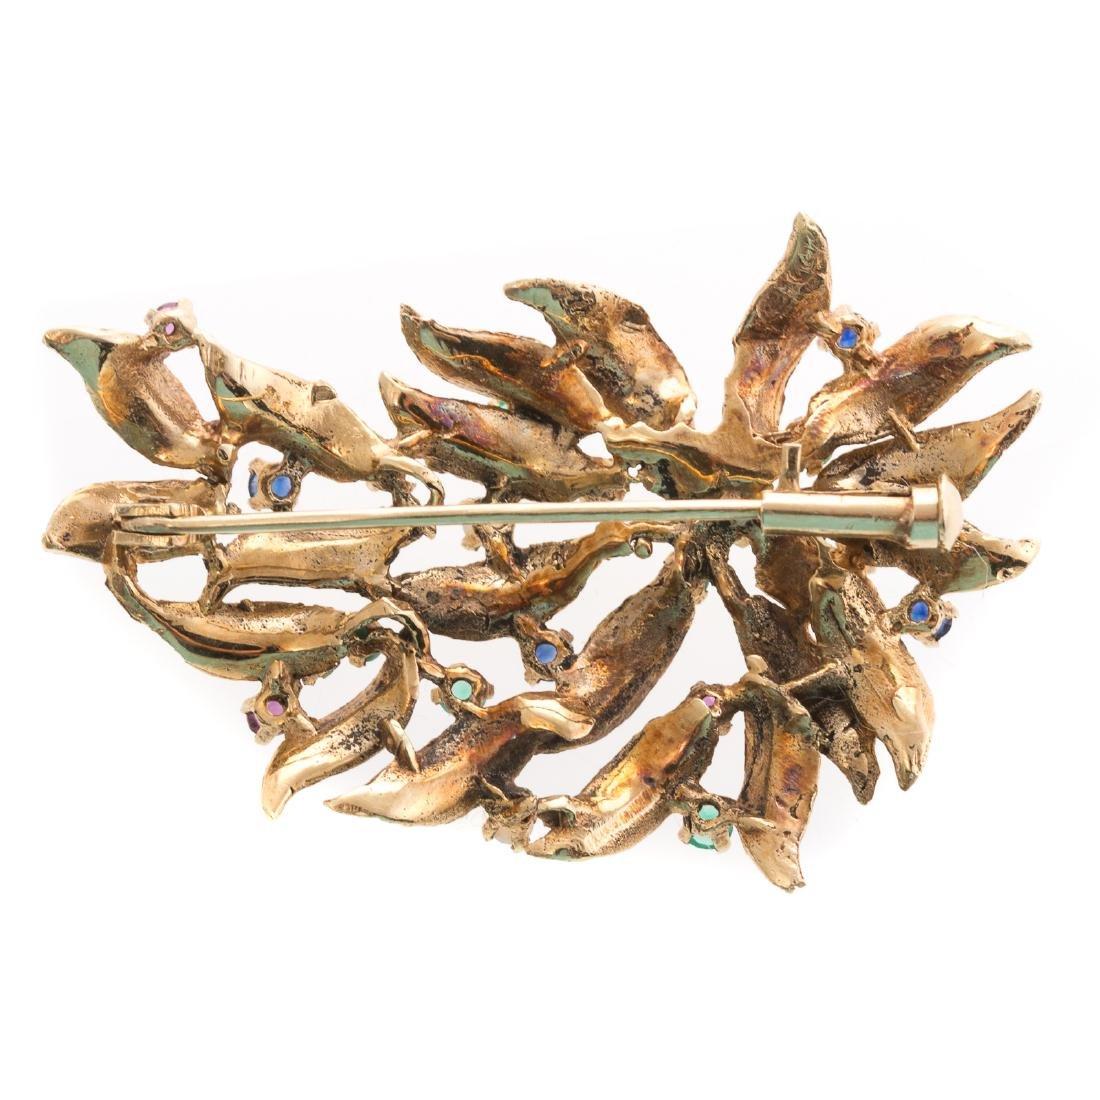 A Lady's Gemstone Brooch in 14K Gold - 3